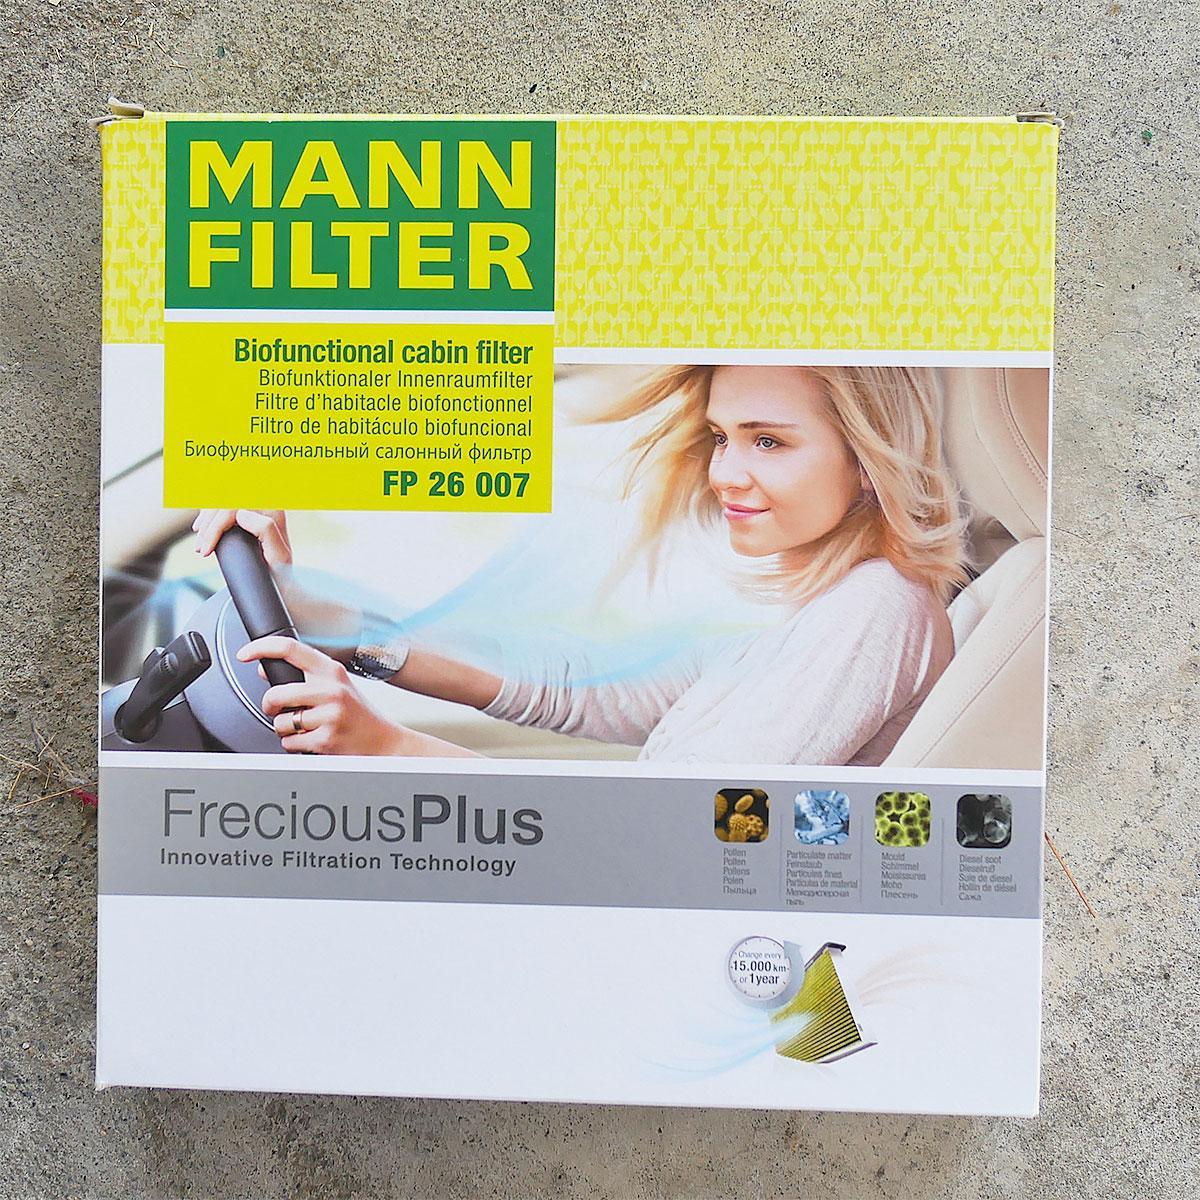 Mann Filter FP 26 007 Filter